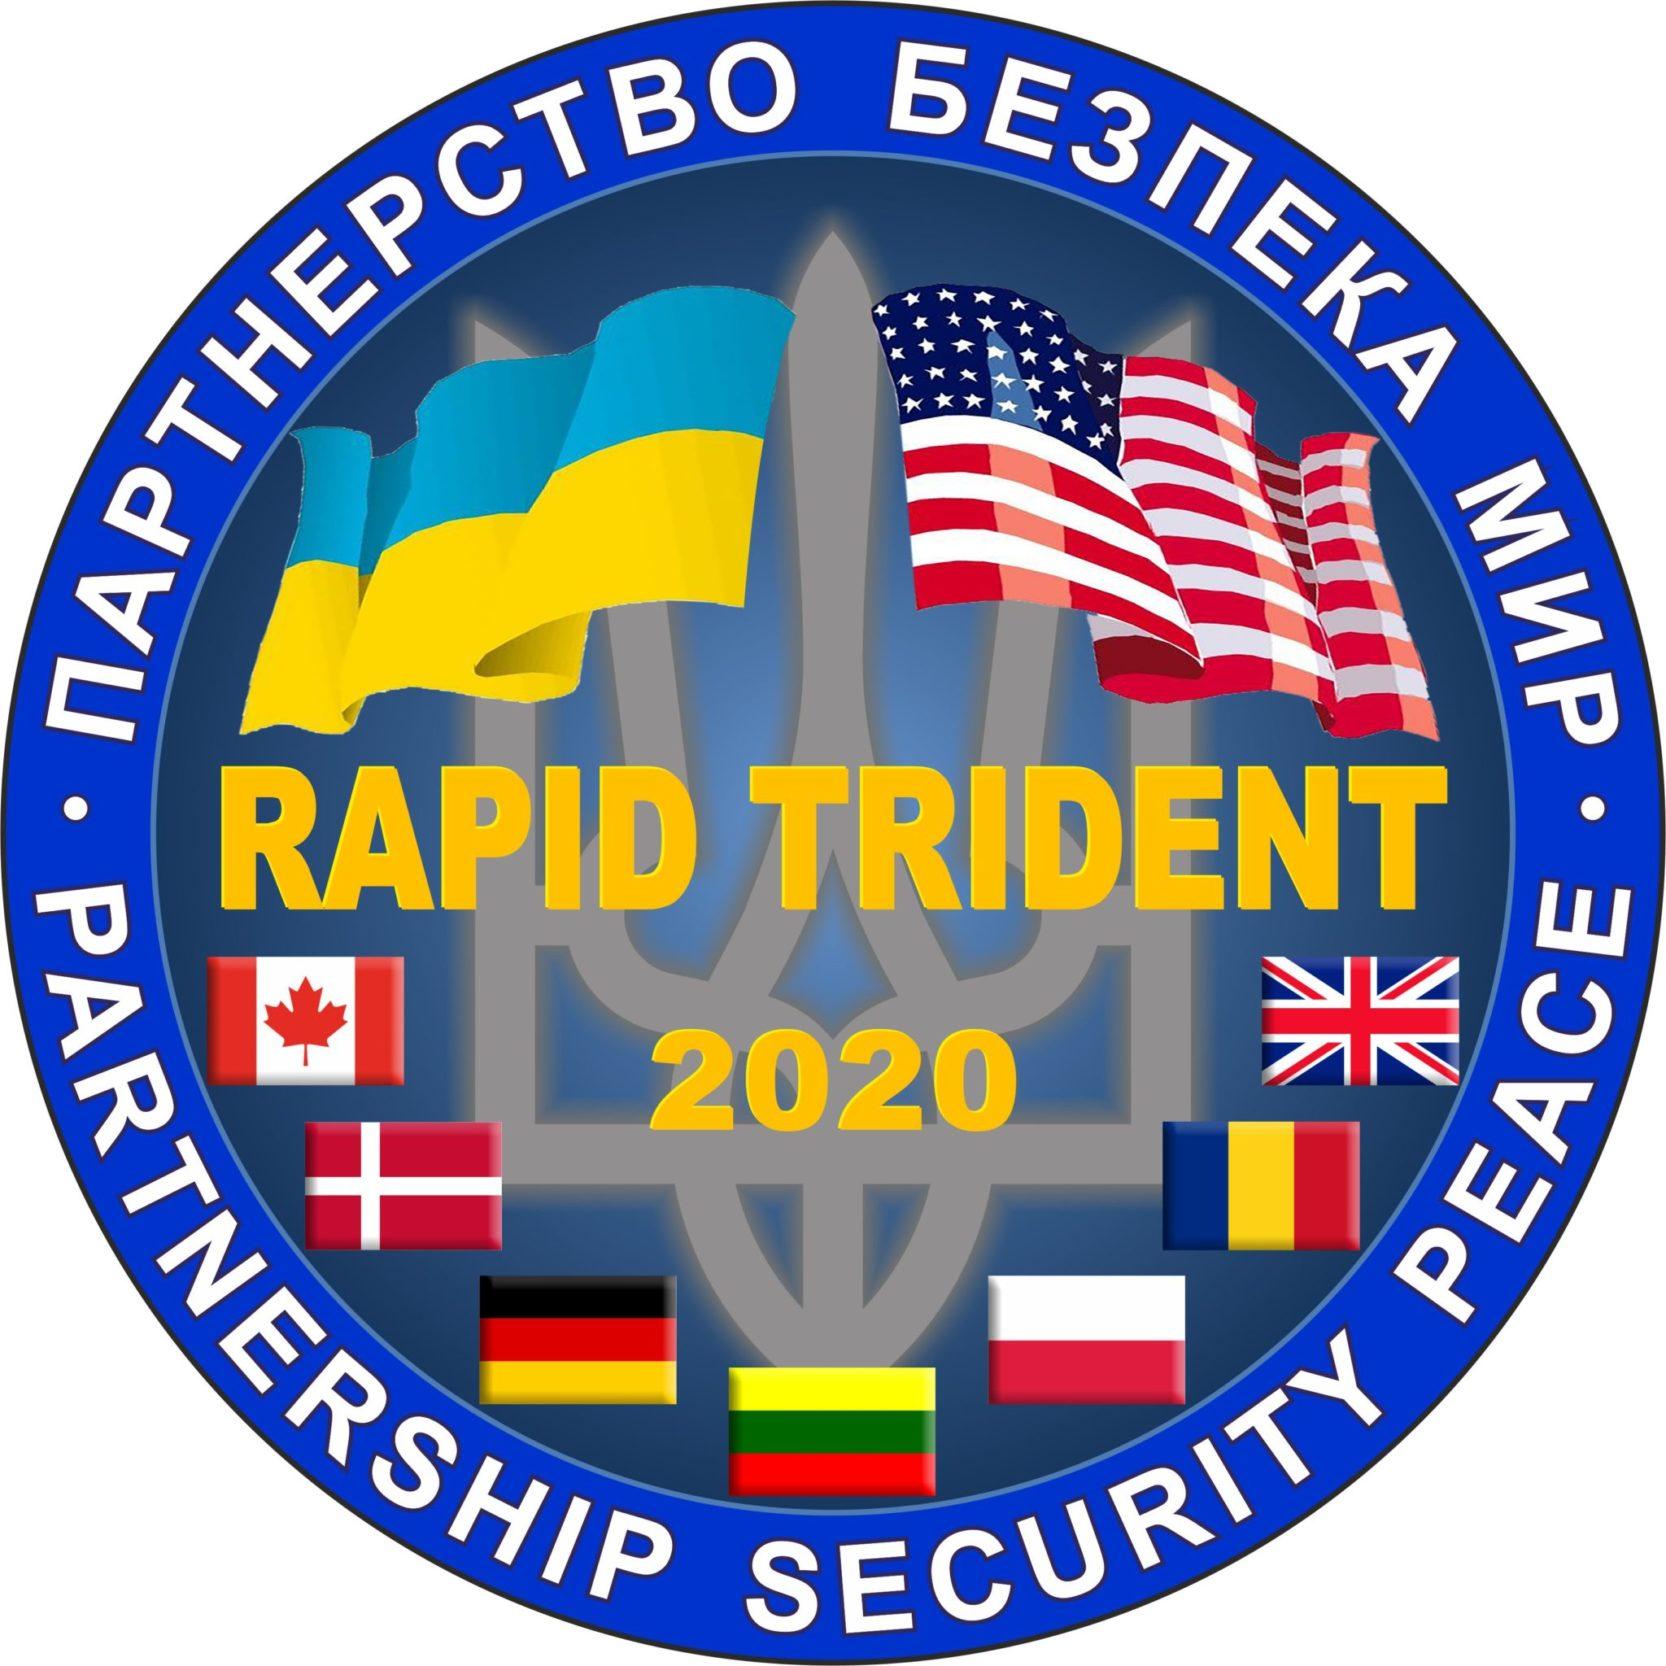 Близько 4000 осіб братимуть участь у Rapid Trident – 2020